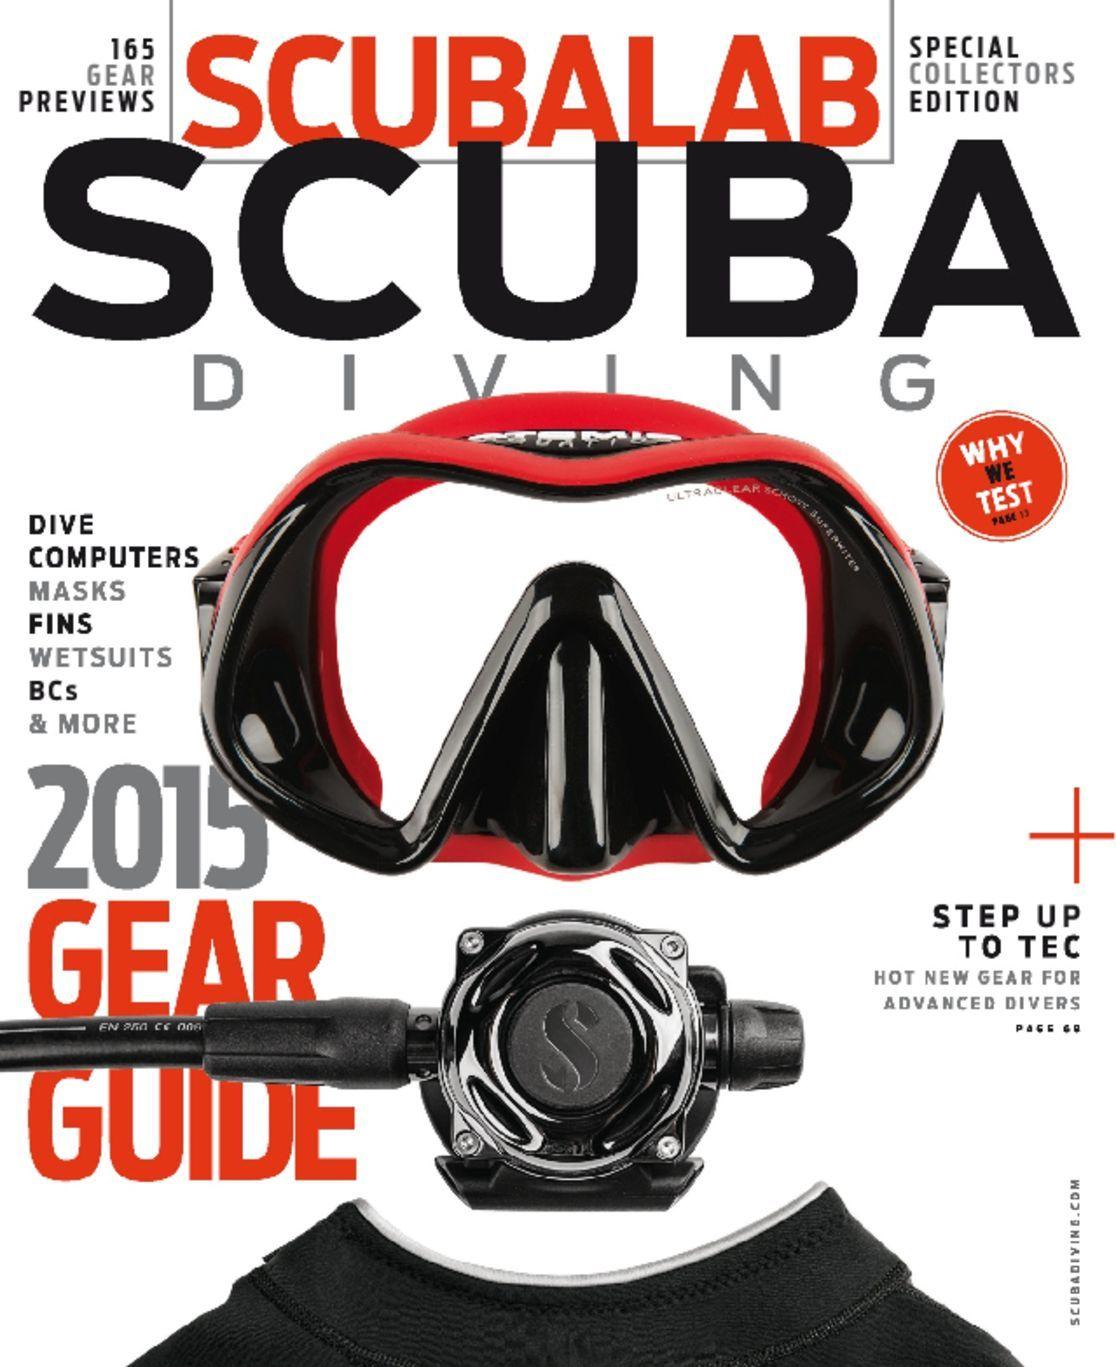 2015 ScubaLab Gear Guide Digital